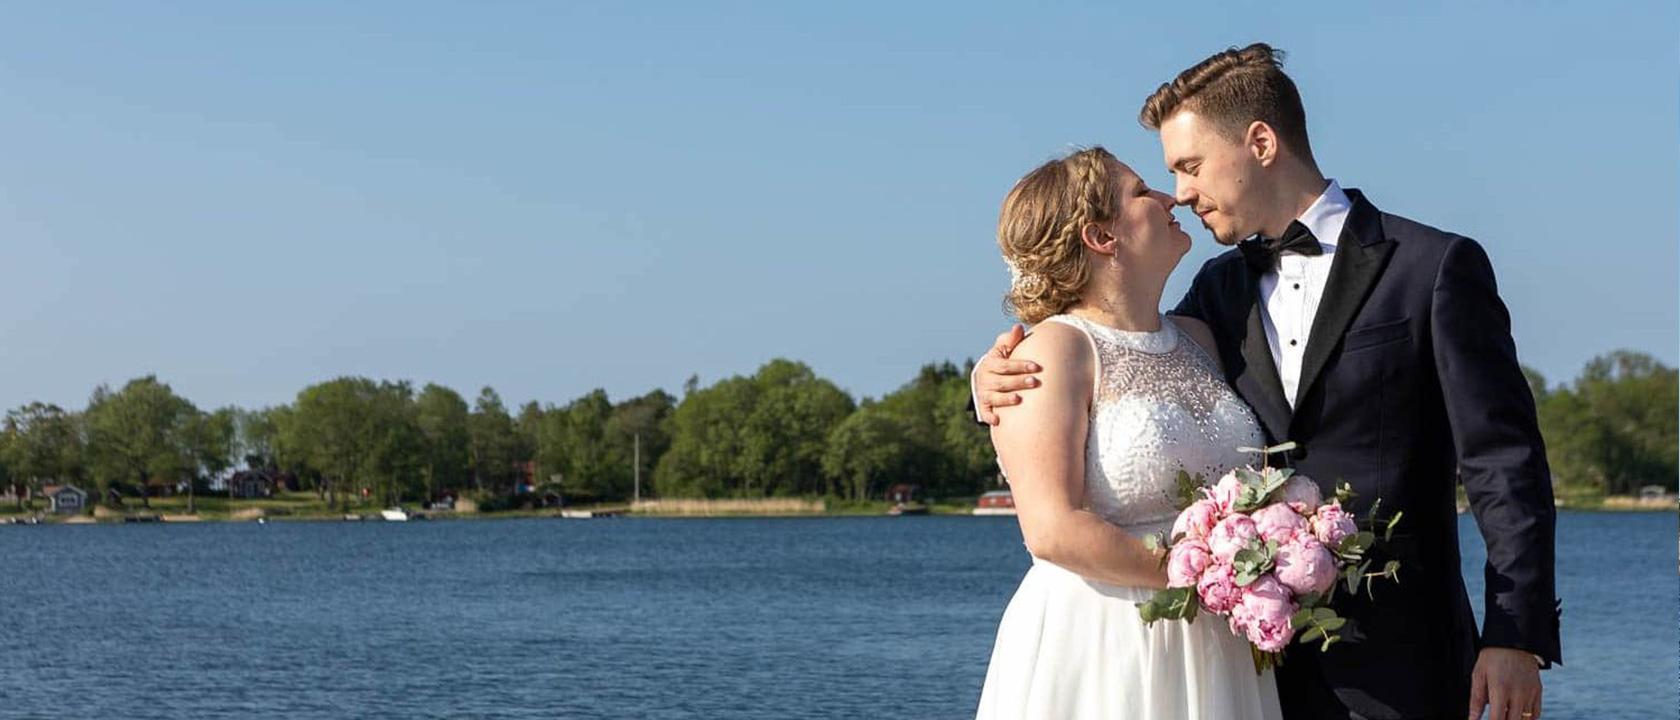 Bröllopsfotografering Sofie & Niclas 2019